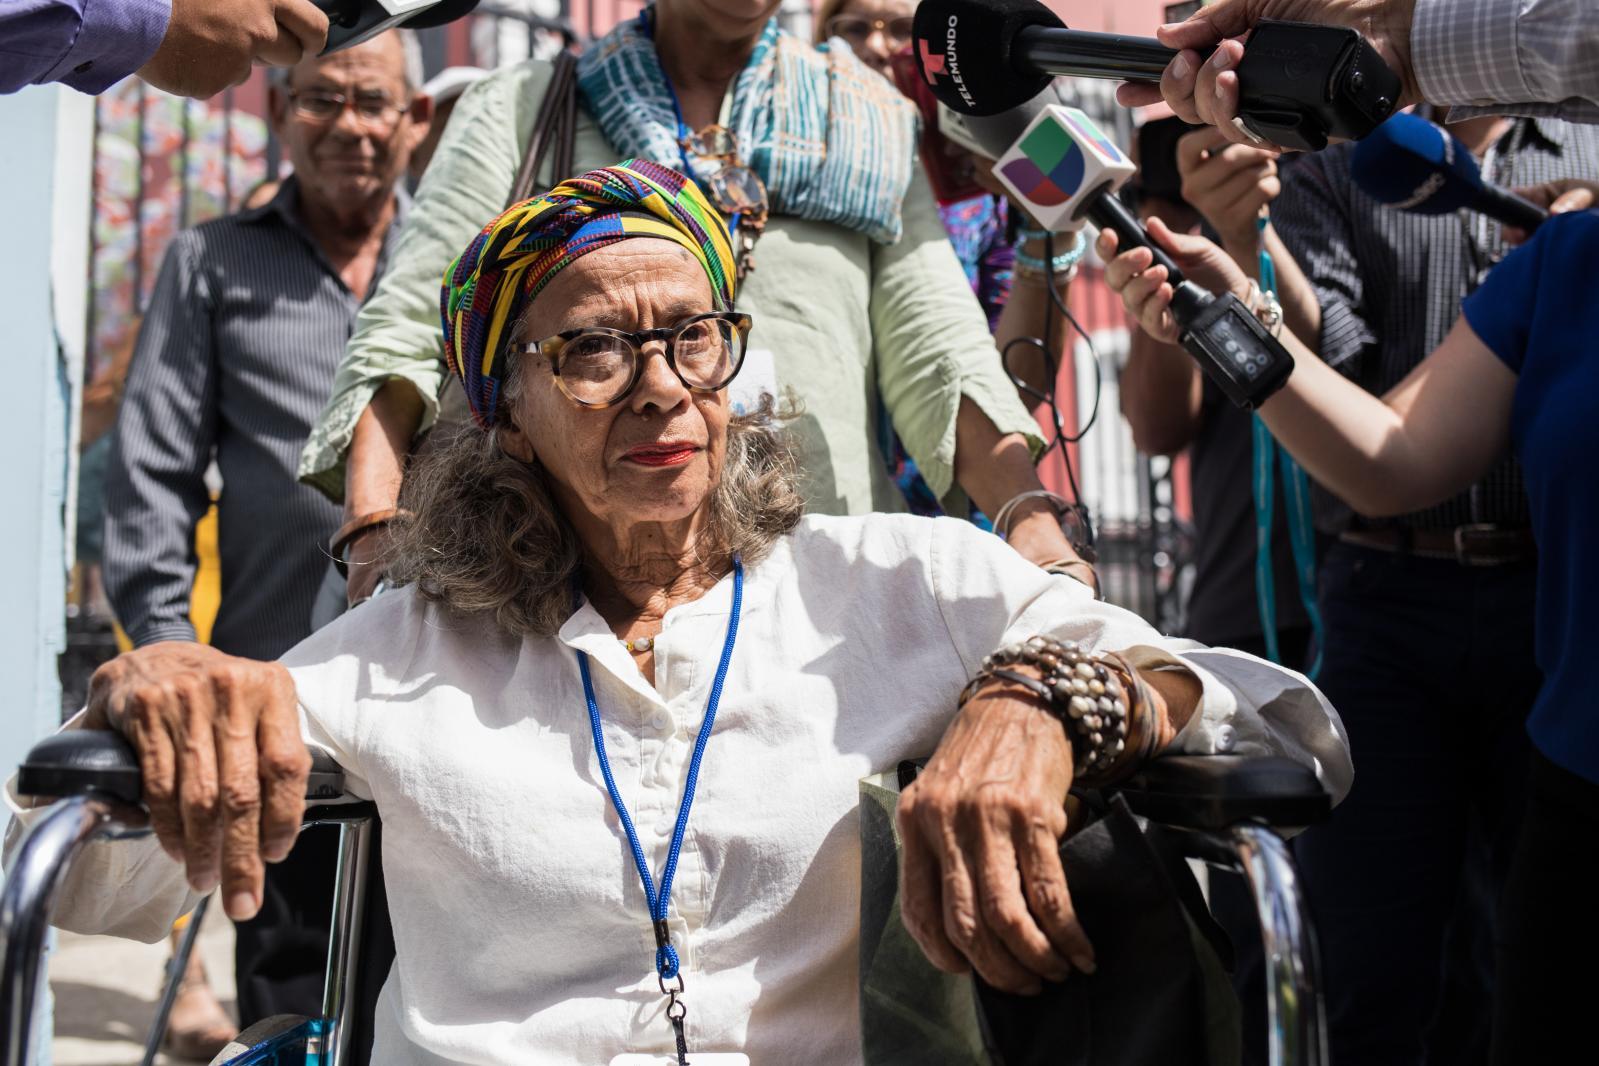 7 de octubre de 2019. Líderes comunitarios de Vieques y Culebra llegan para reunirse con la gobernadora Wanda Vázquez